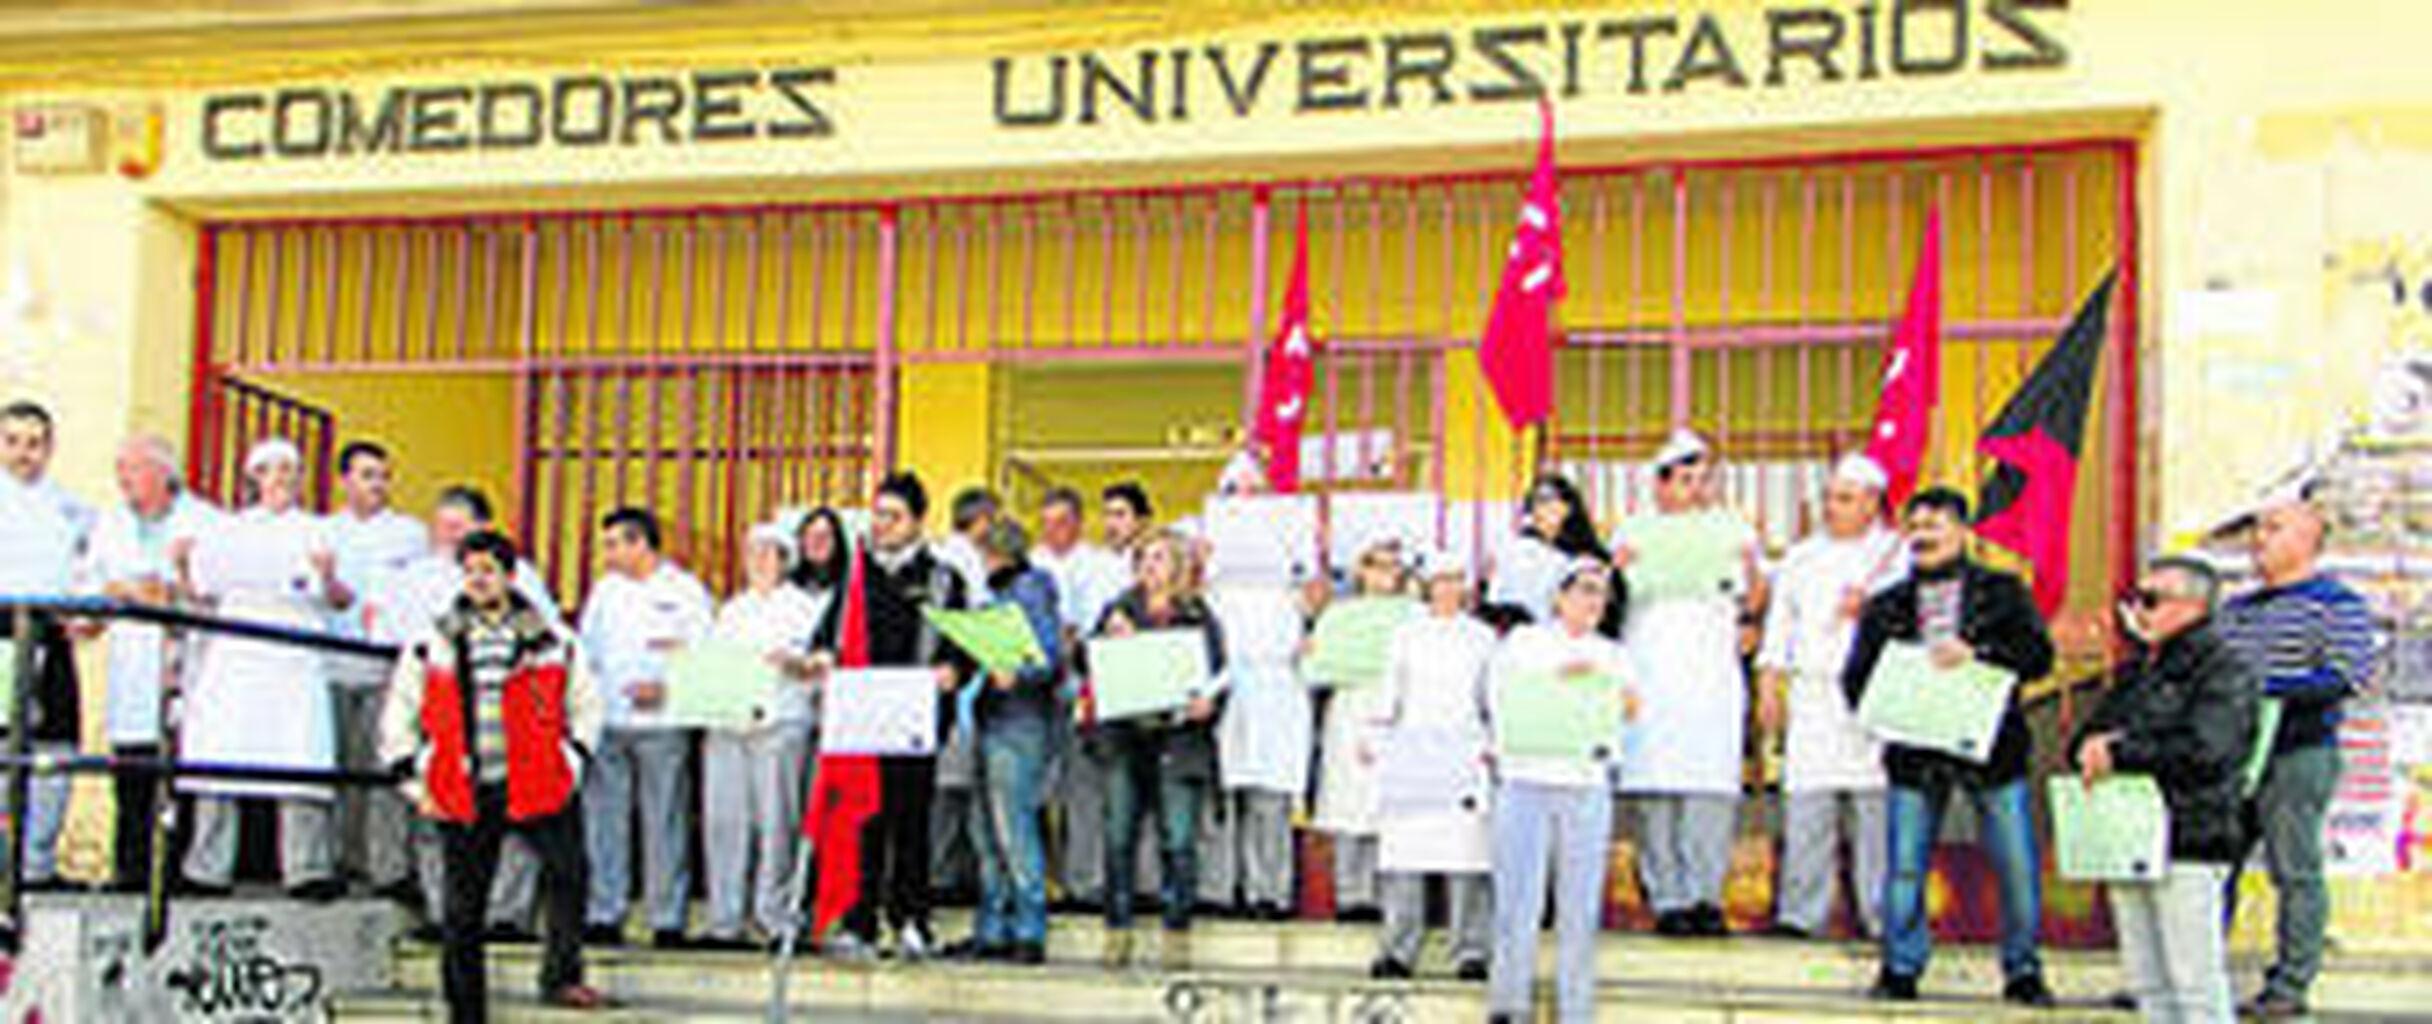 La huelga de comedores afecta a más de 1.700 alumnos de la UGR